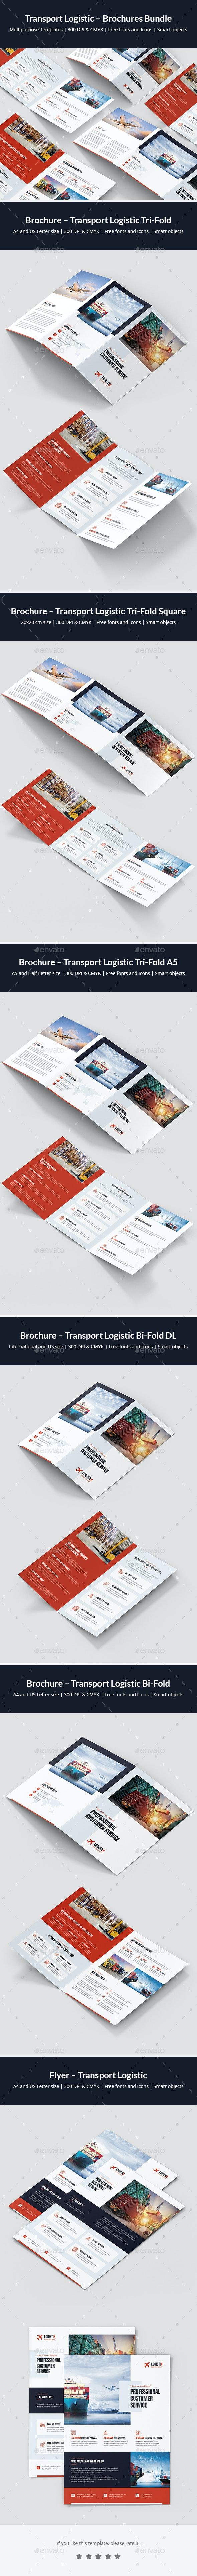 Transport Logistic – Brochures Bundle Print Templates 6 in 1 - Corporate Brochures